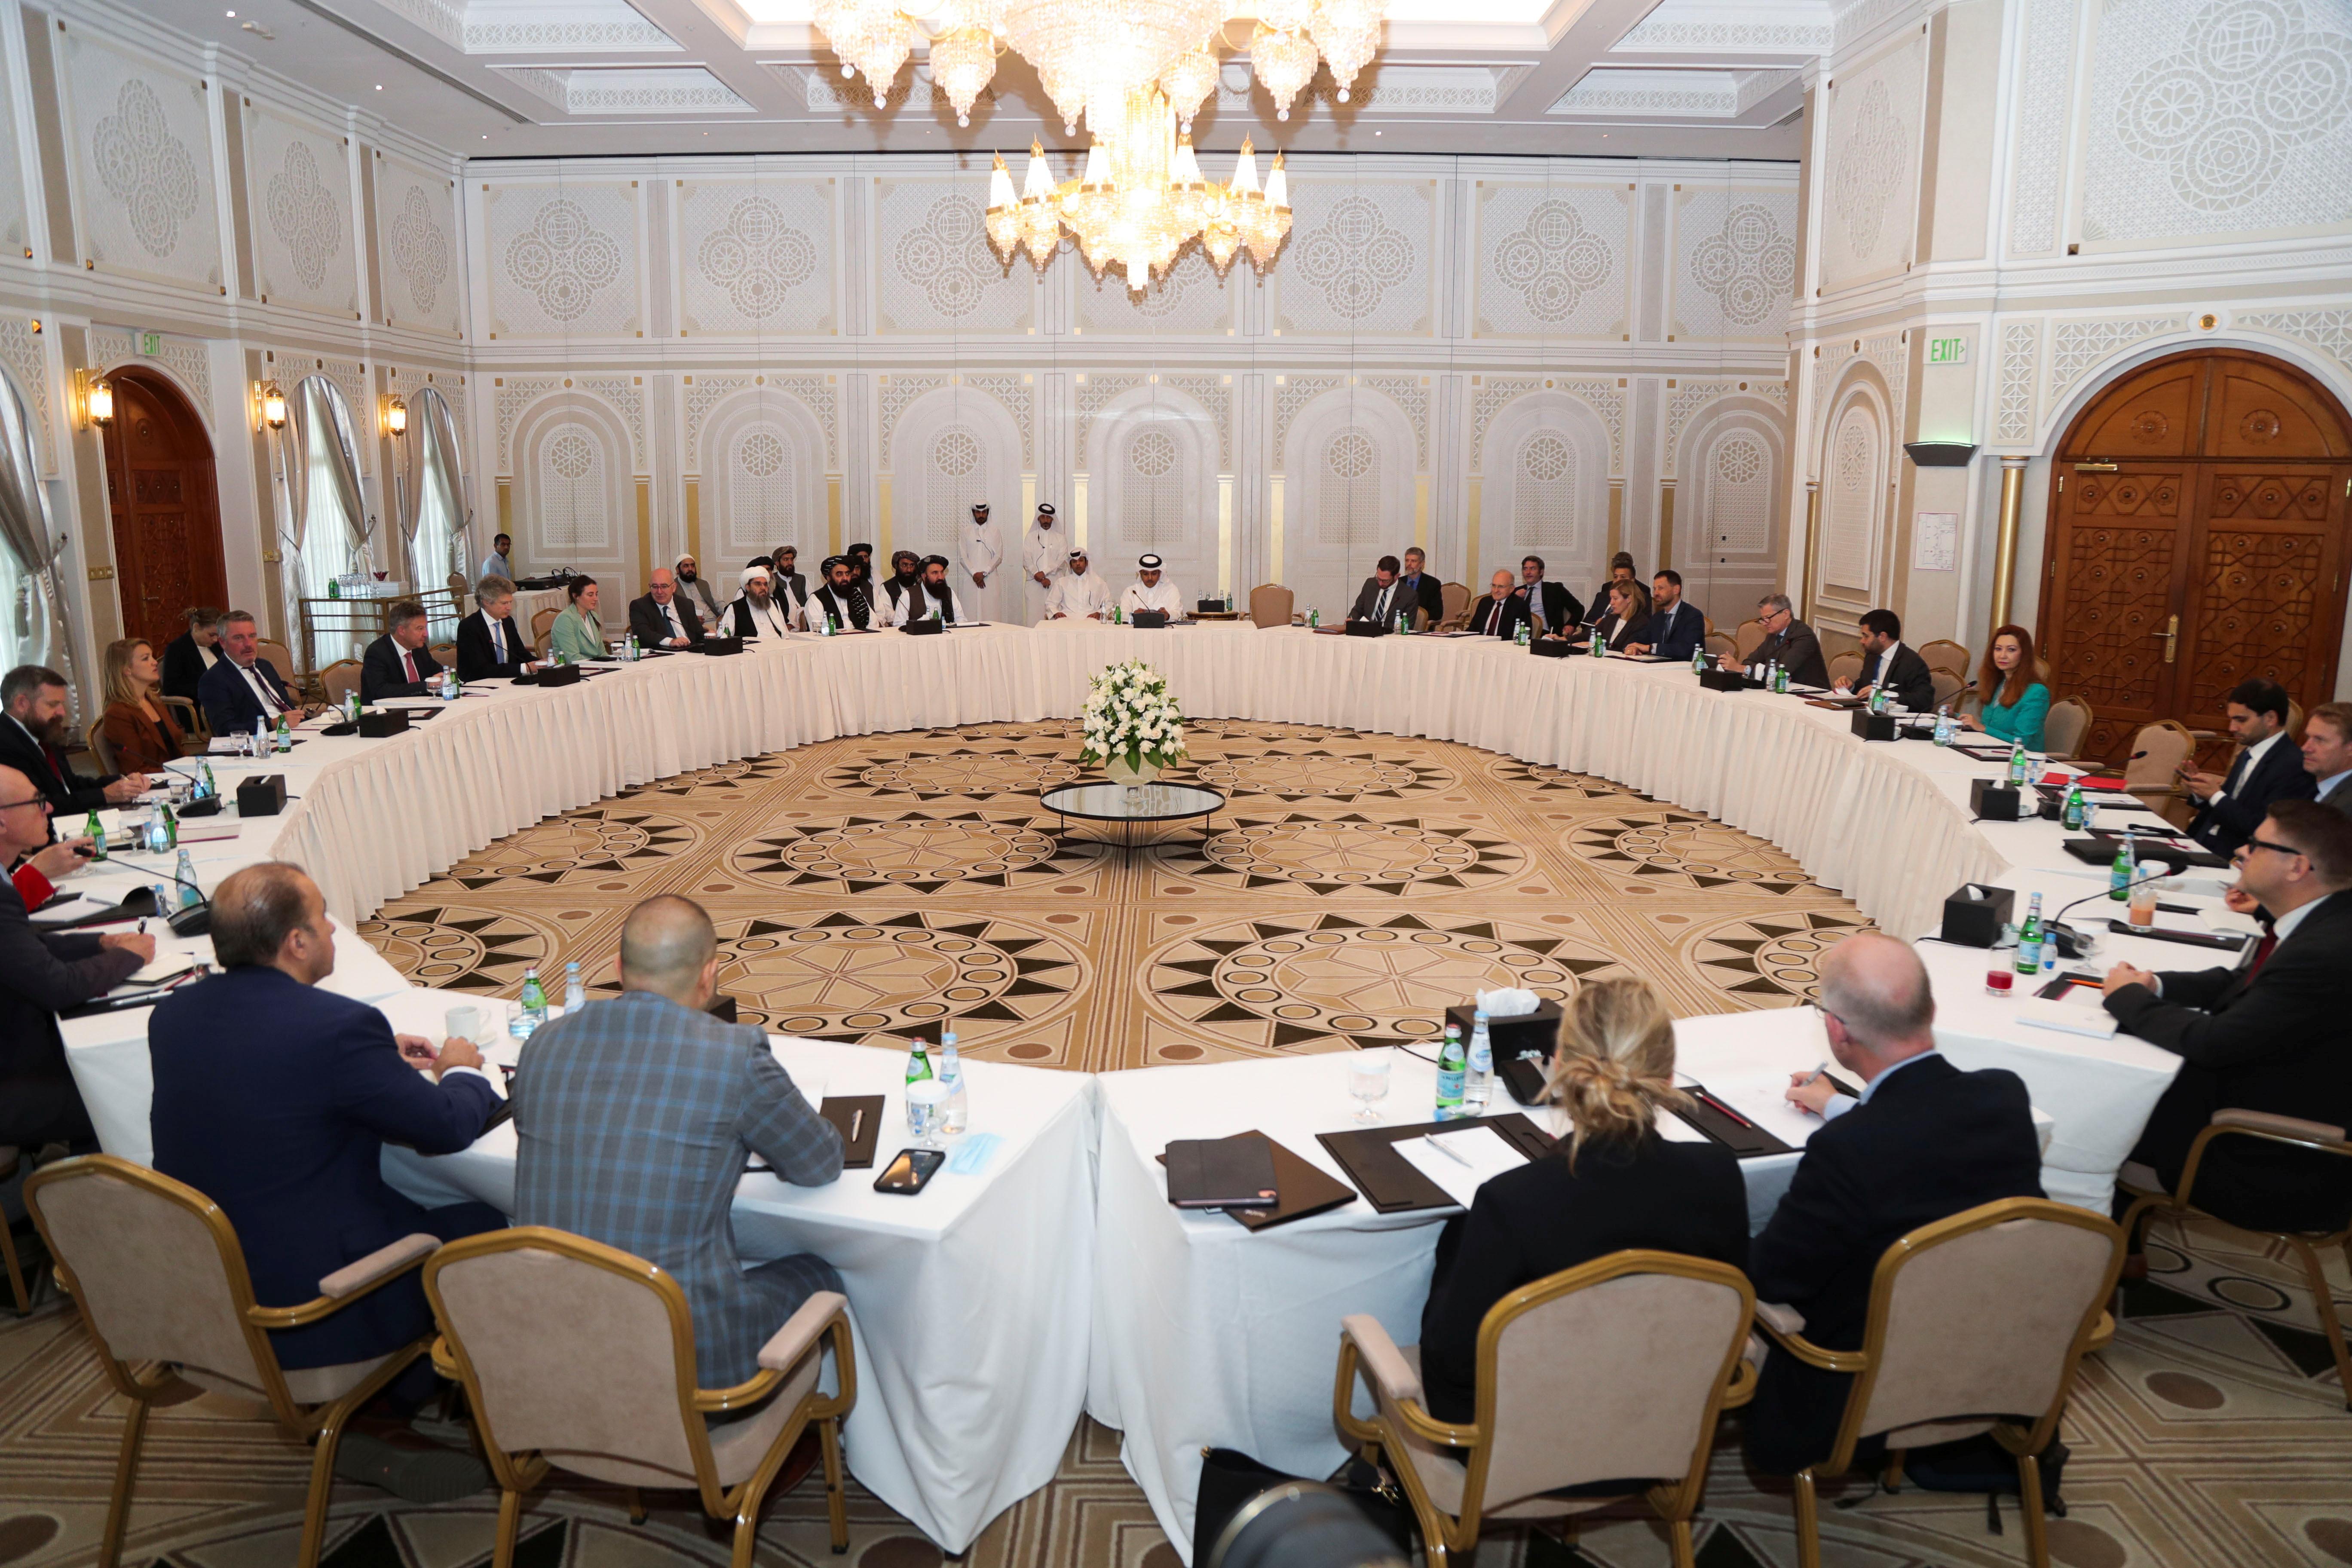 Taliban delegates meet with U.S. and European delegates in Doha, Qatar October 12, 2021. REUTERS/Stringer